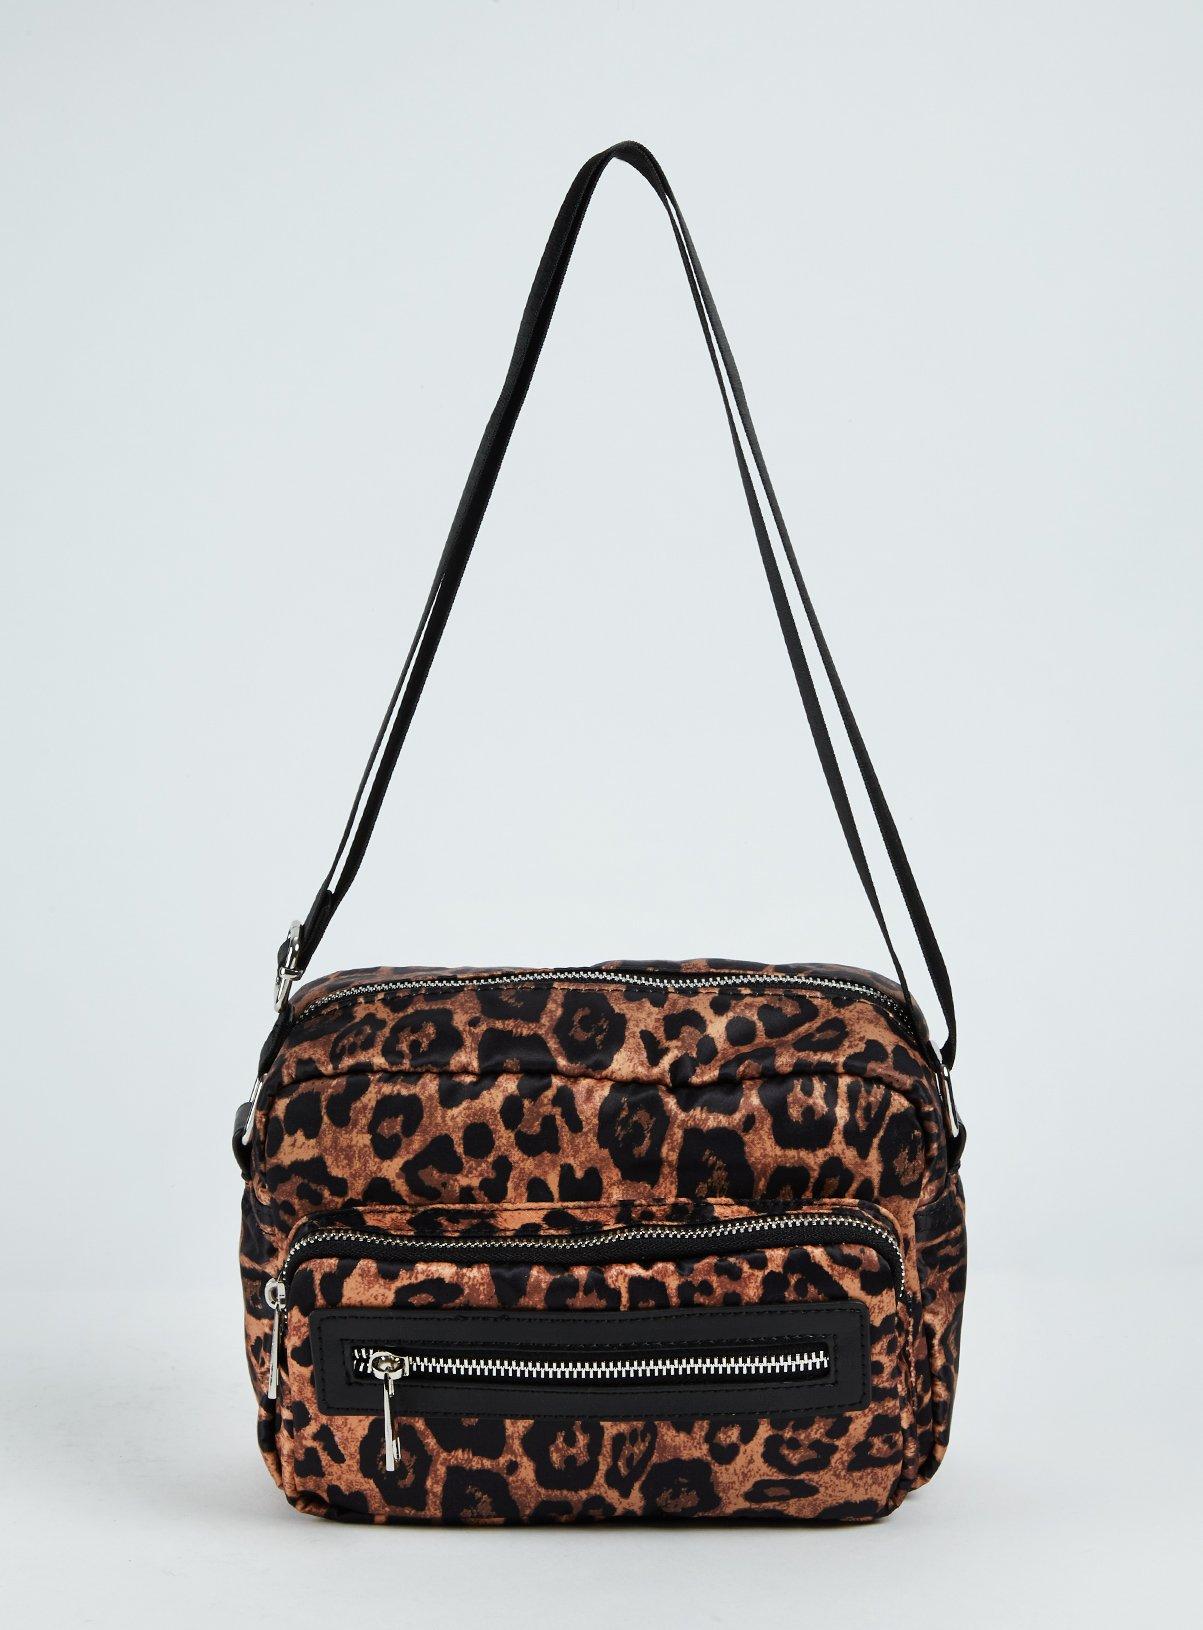 Leopard Print Camera Bag - One Size